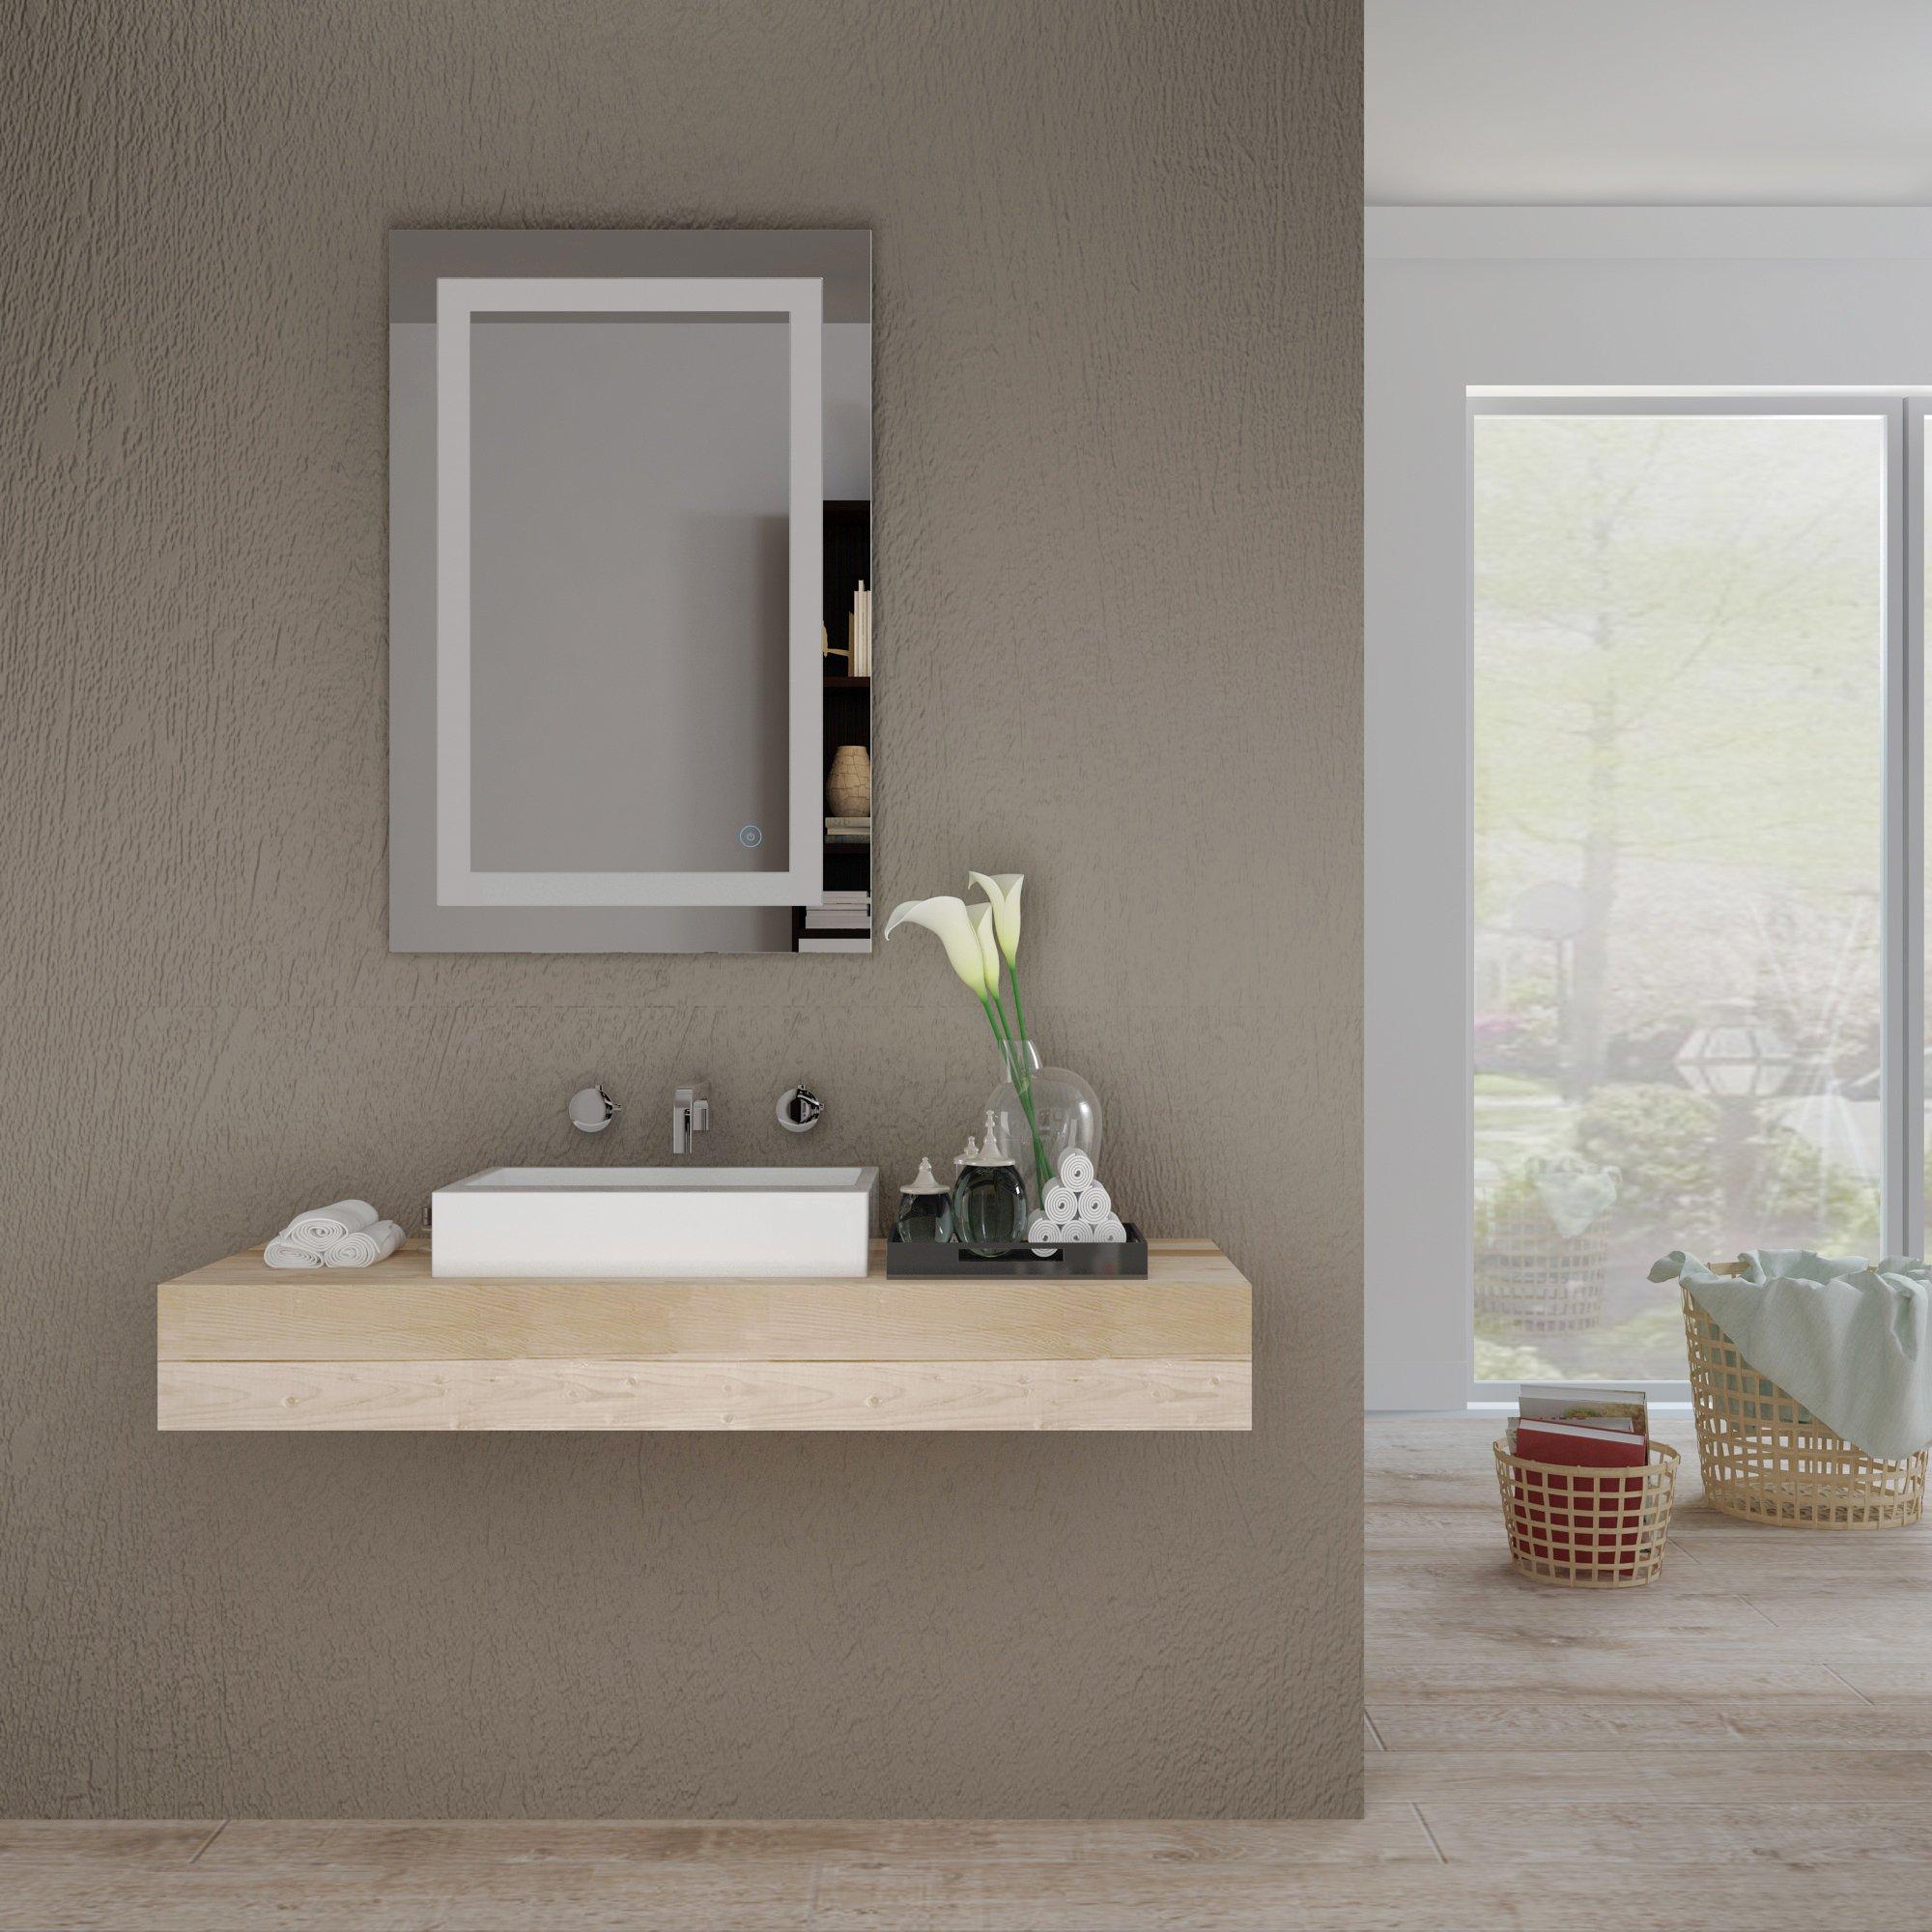 Home sceva led lighted mirrors vanity bathroom frameless - Illuminated wall mirrors for bathroom ...